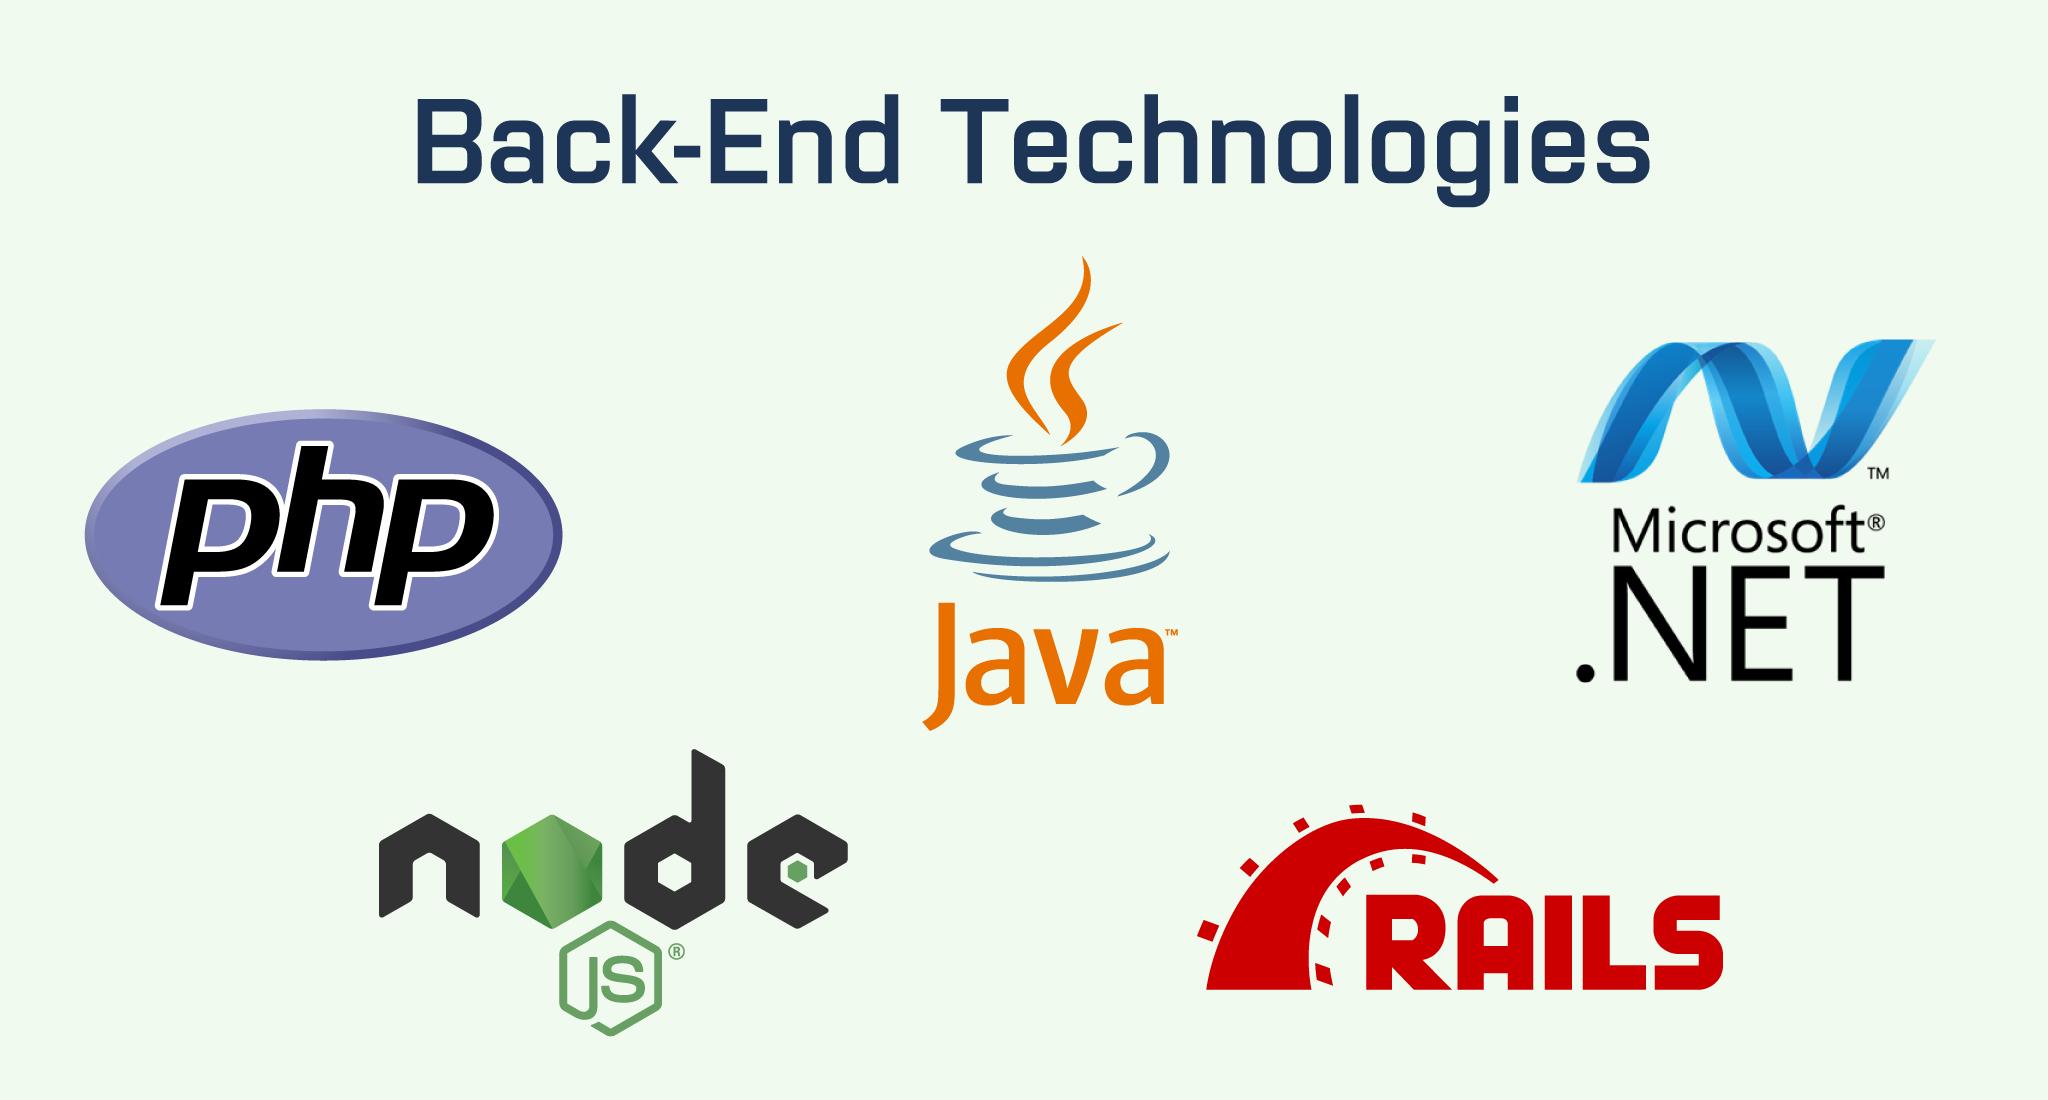 Back-end technologies